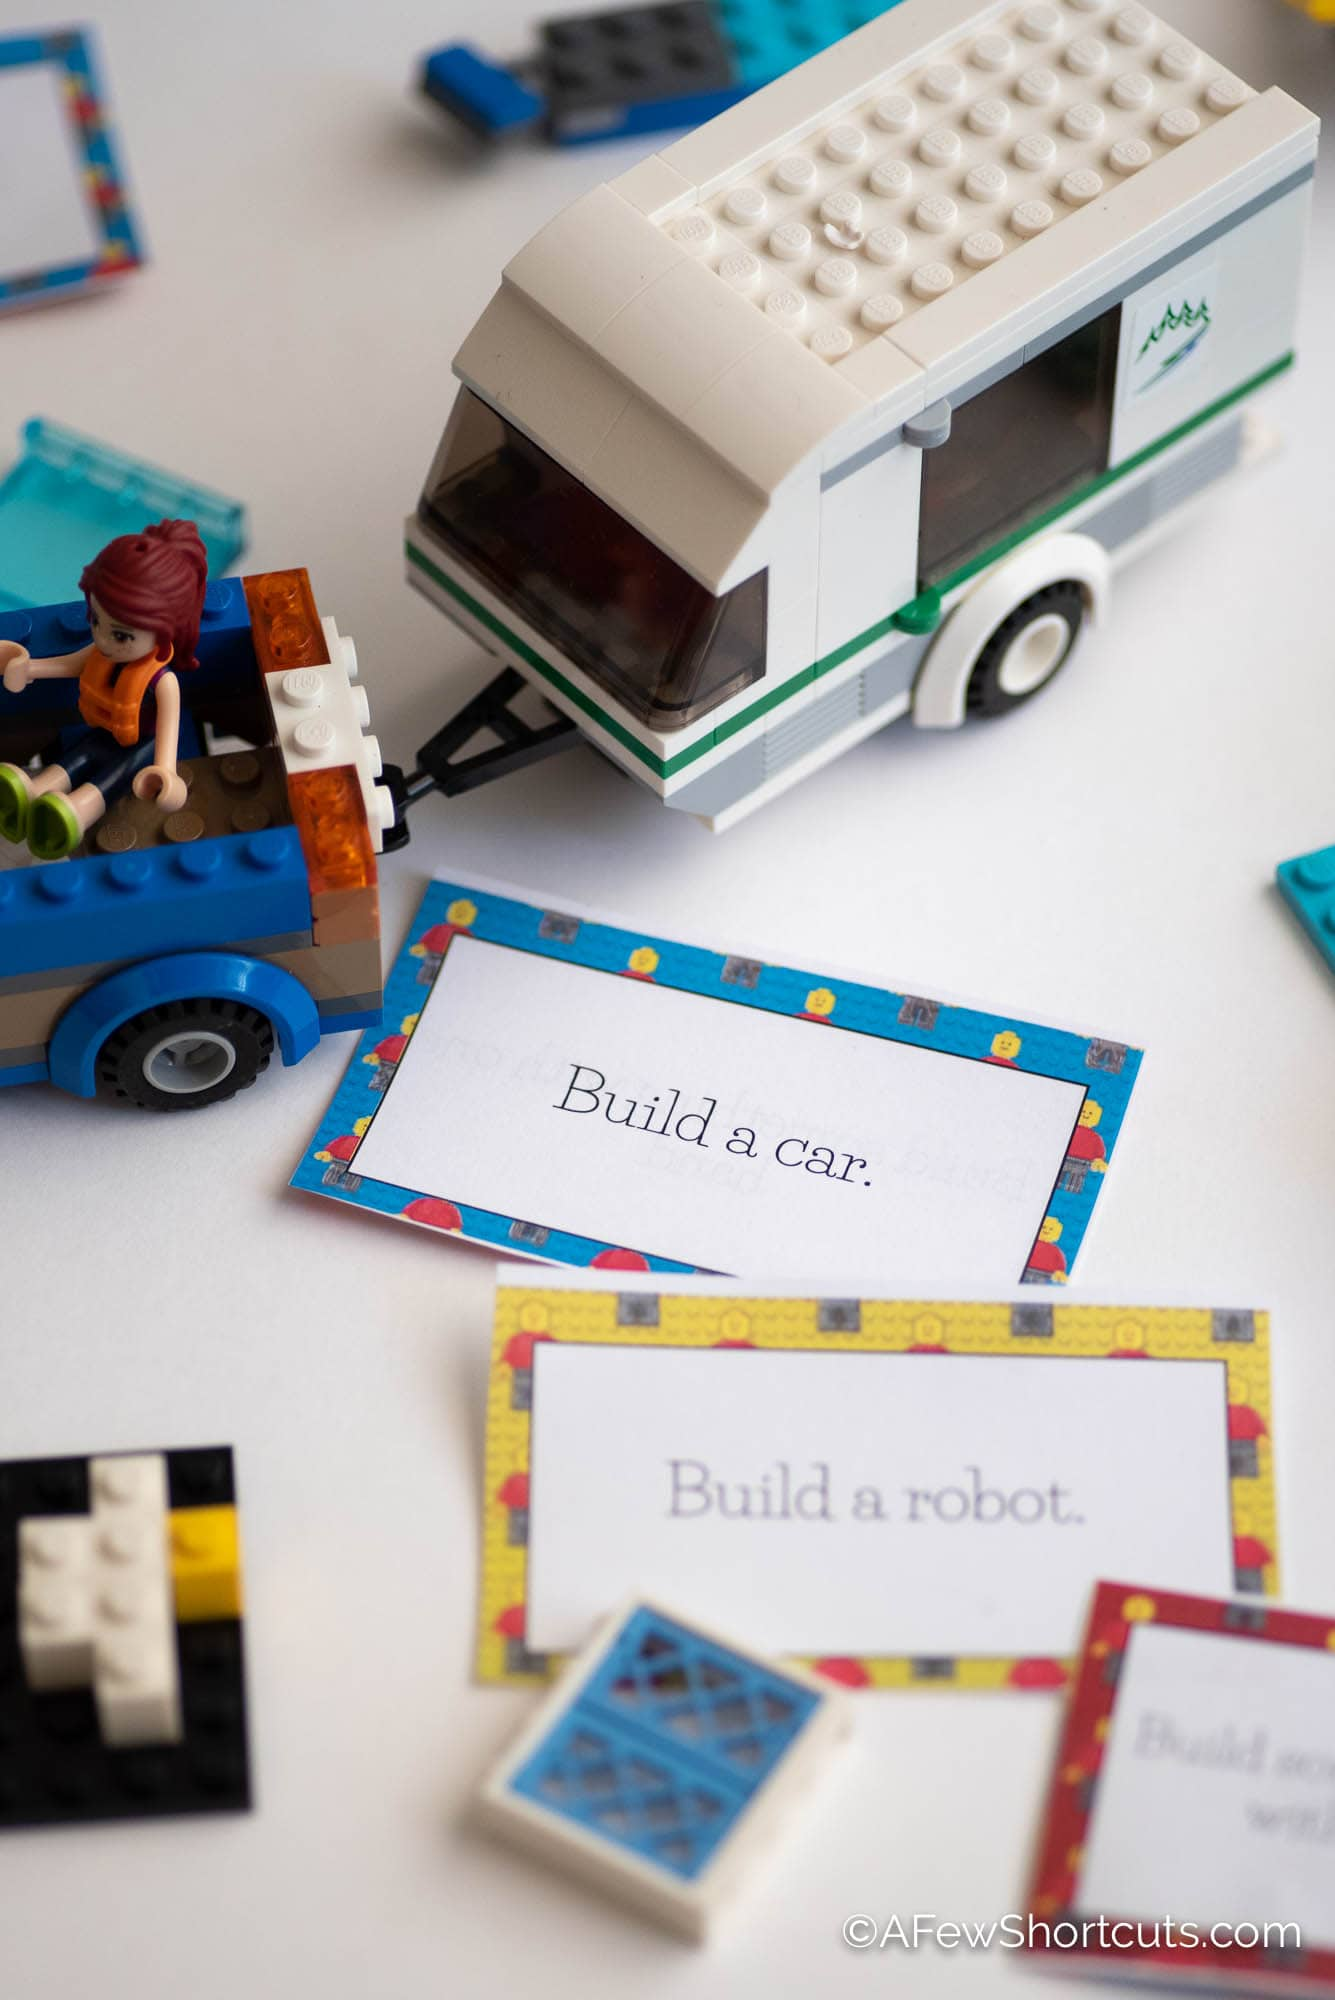 photograph regarding Lego Birthday Card Printable called Cost-free Printable Lego Birthday Playing cards - Resume Illustrations